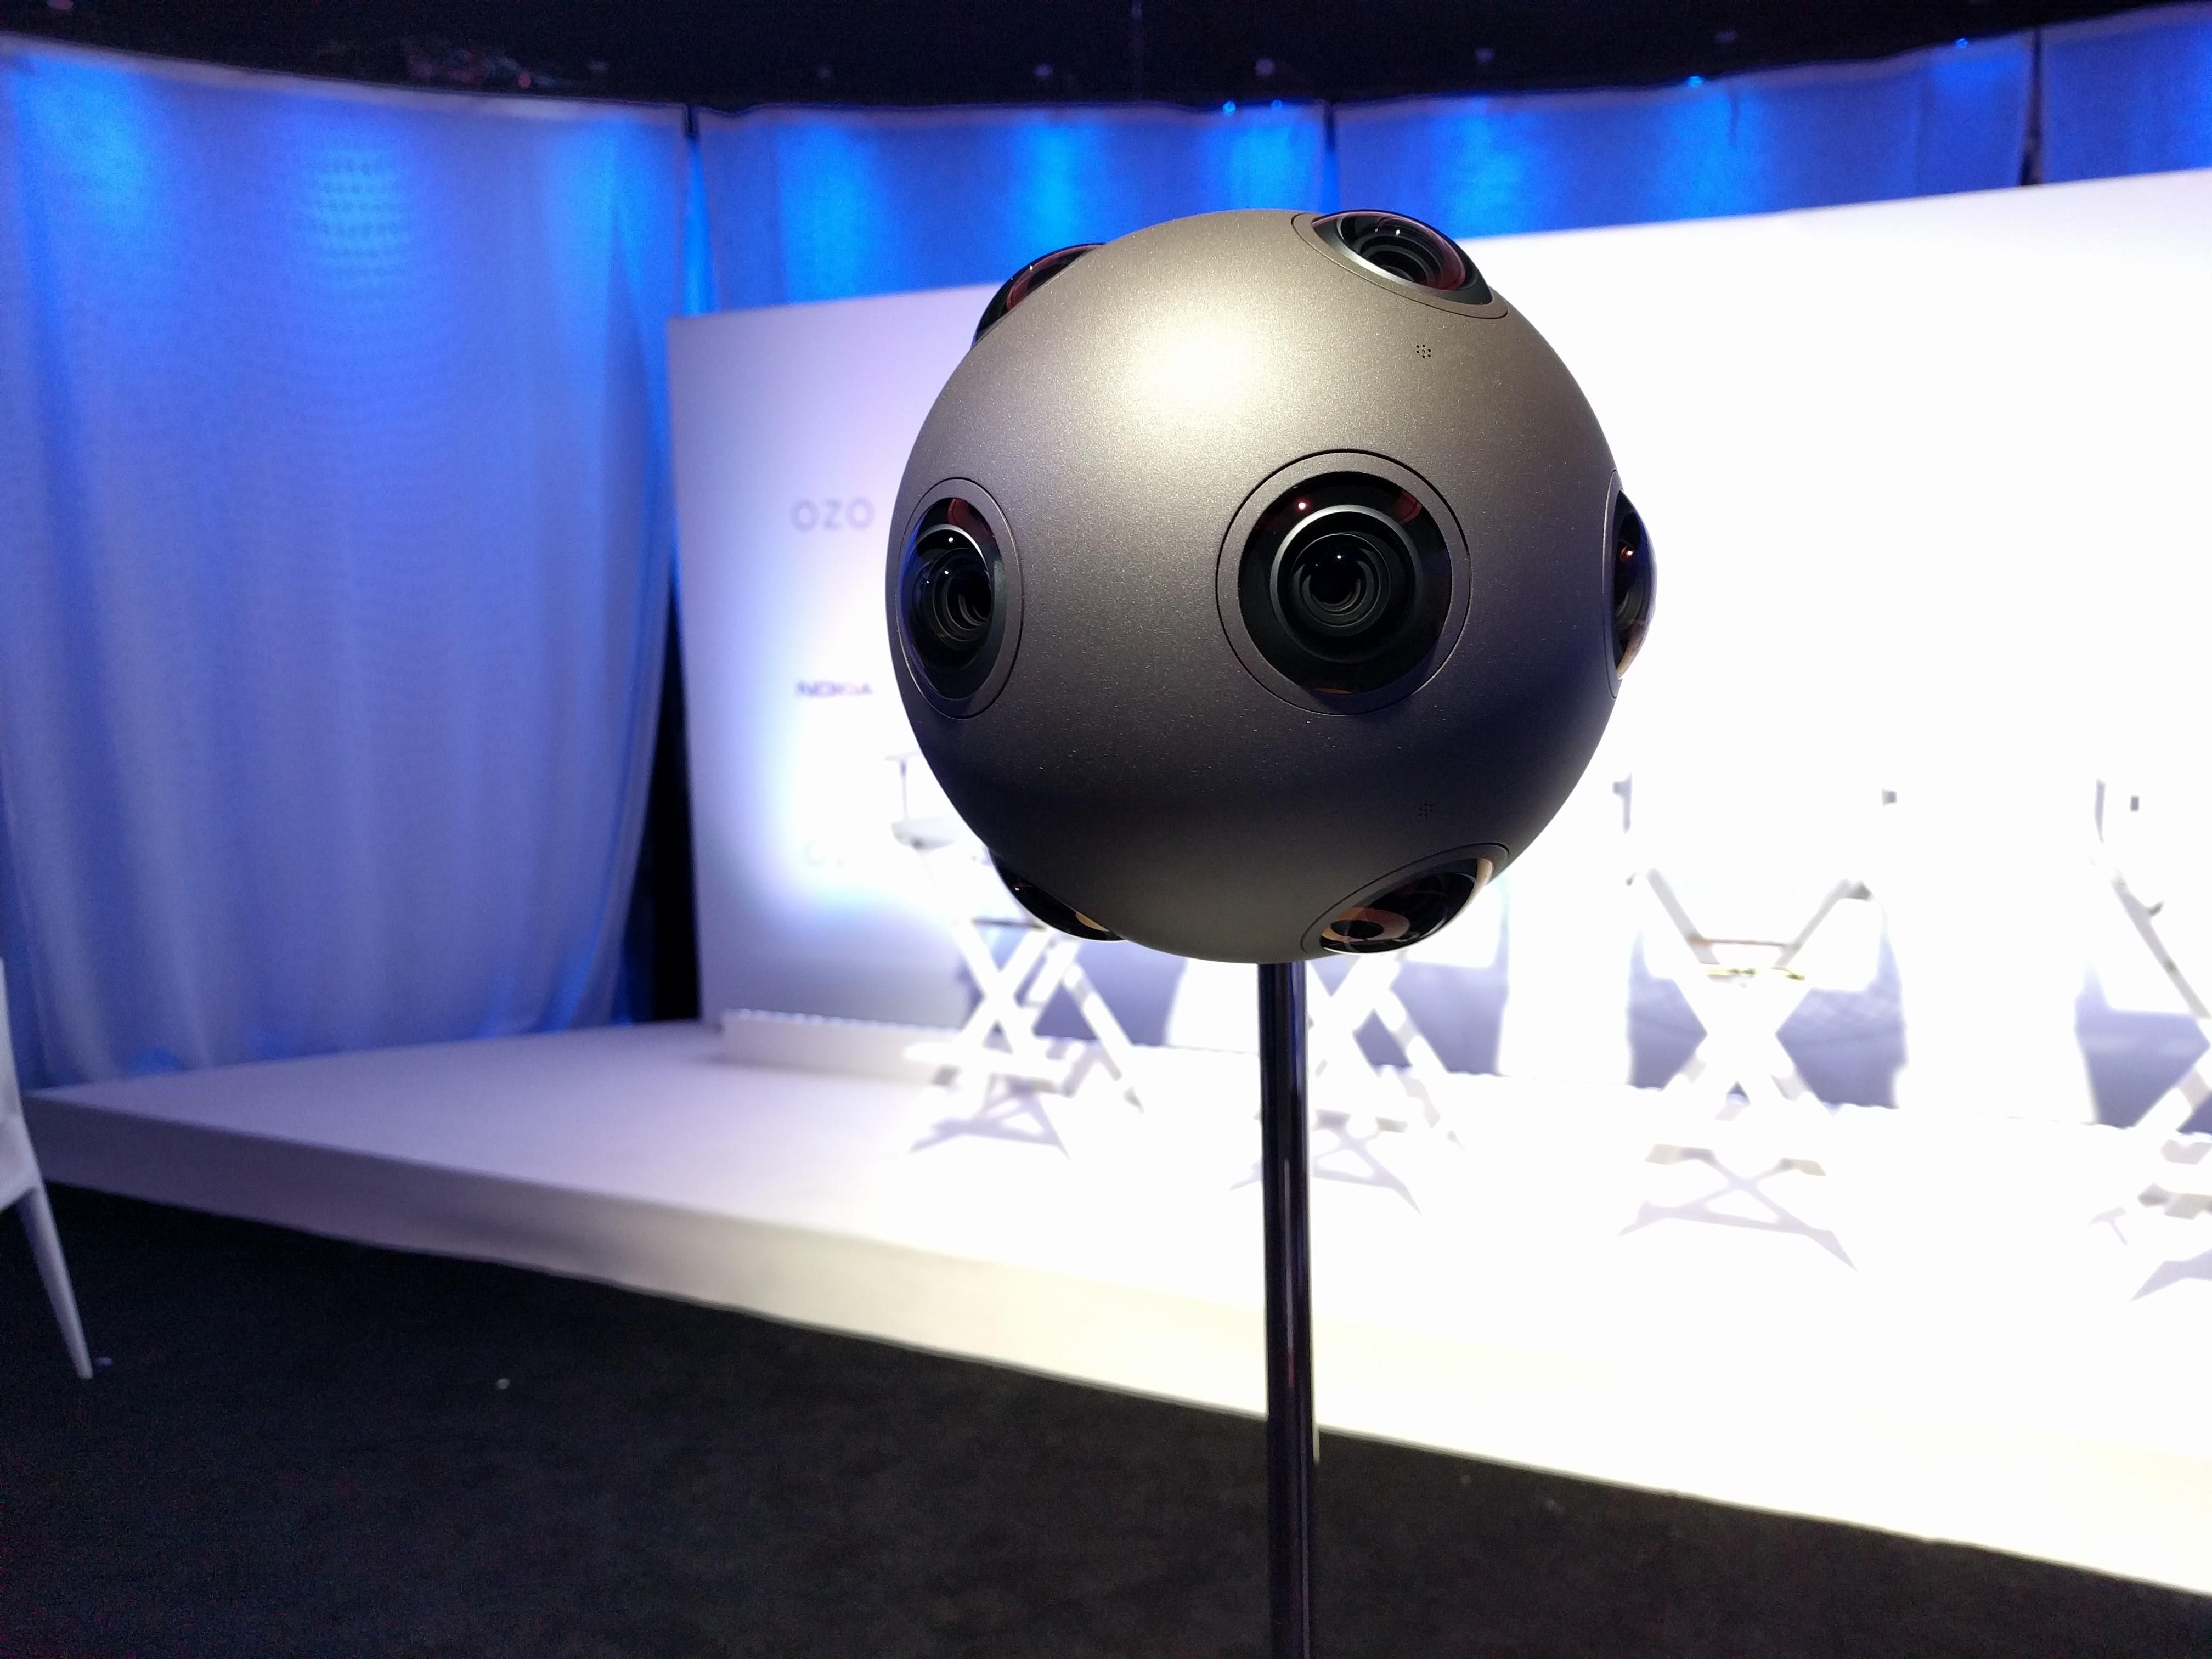 The Nokia Ozo virtual reality camera.